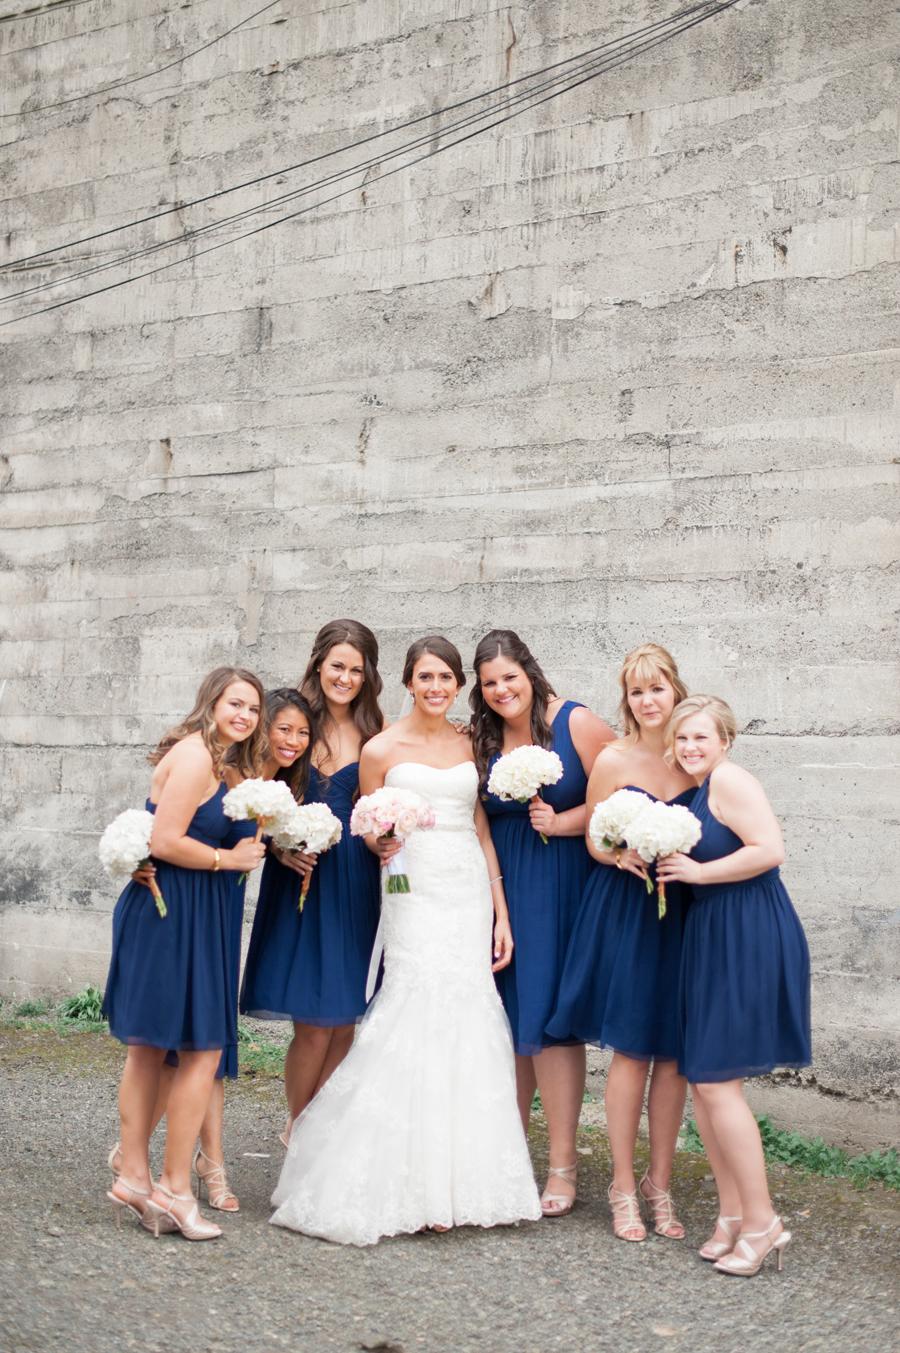 Knee length navy bridesmaids dresses elizabeth anne designs the knee length navy bridesmaids dresses elizabeth anne designs the wedding blog ombrellifo Gallery